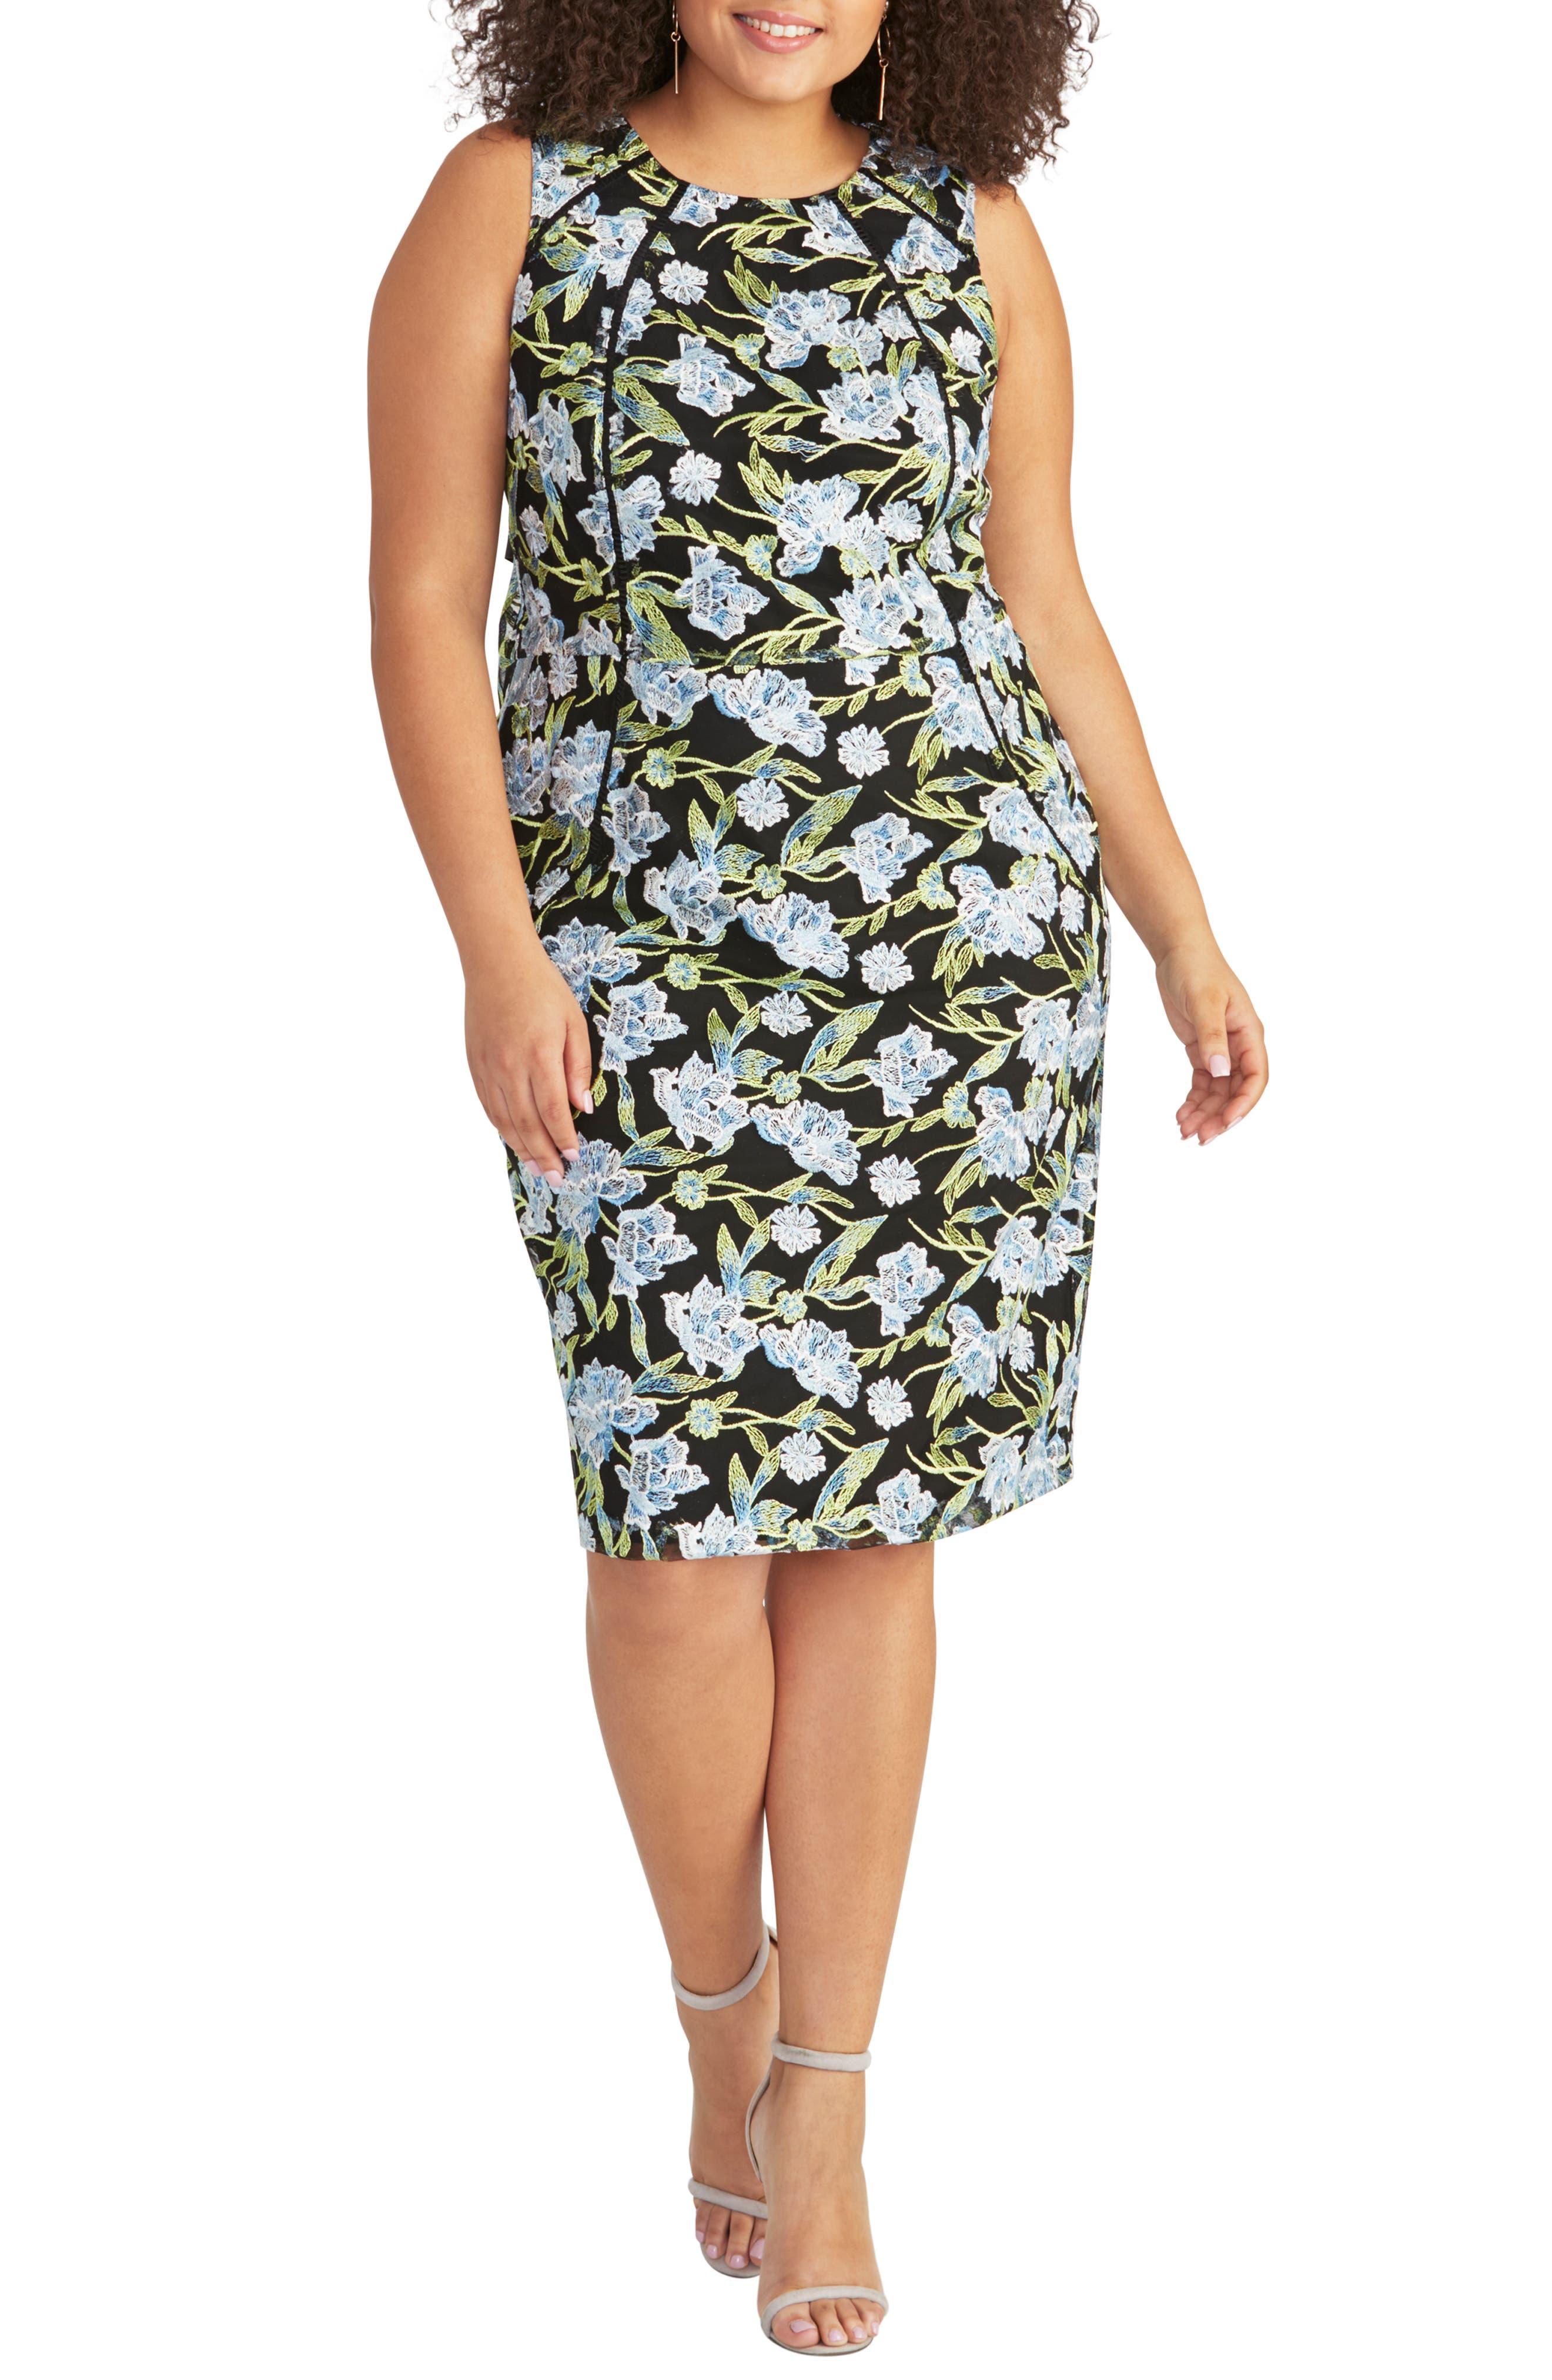 Plus Size Rachel Rachel Roy Embroidered Floral Sheath Dress, Black